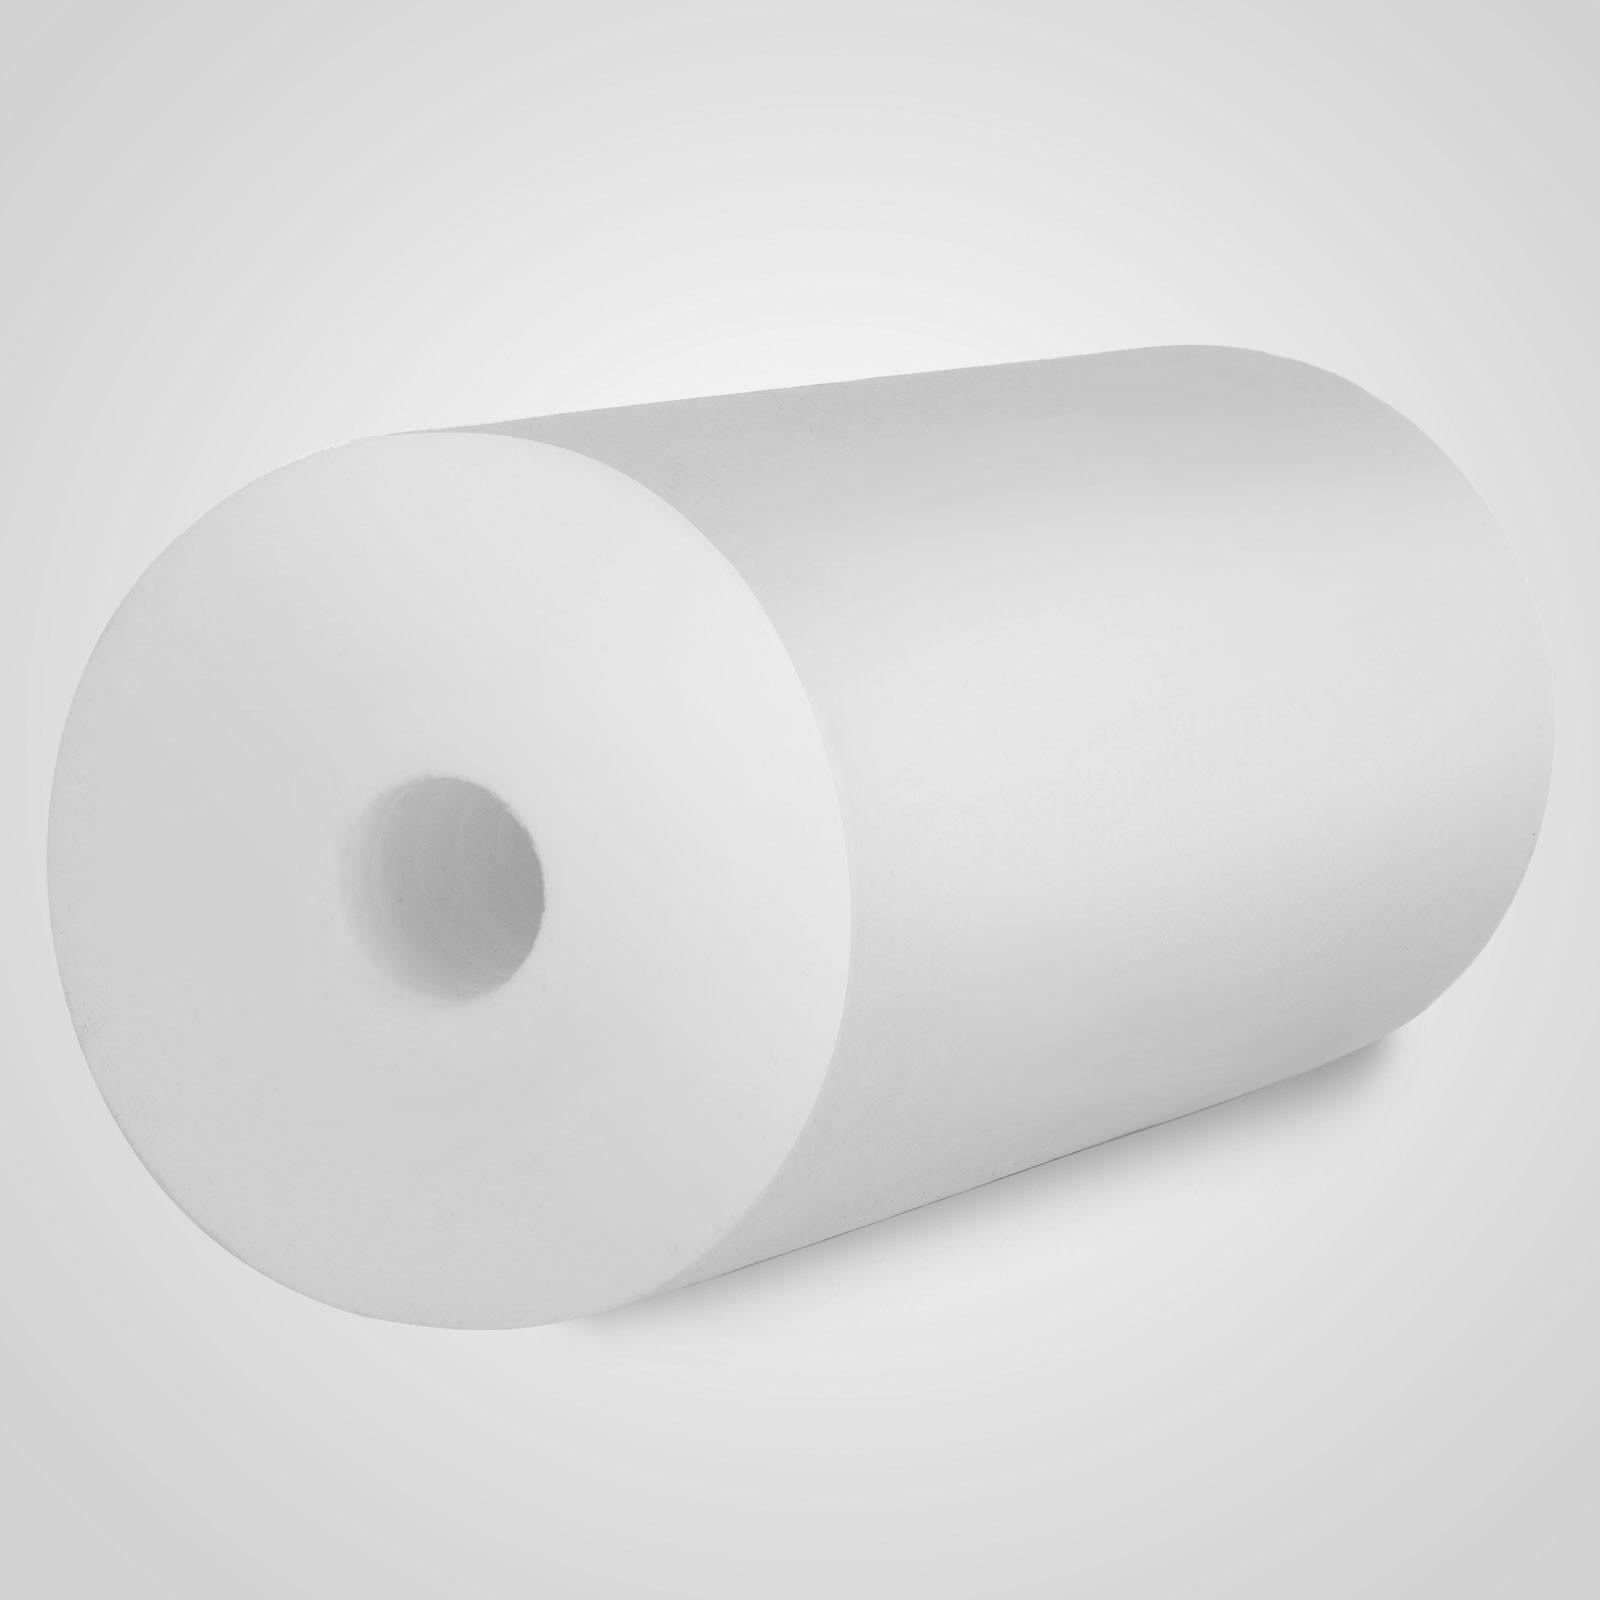 20Pcs-Cartouche-Filtrante-5-Micron-10-034-X-4-5-034-as-Brita-Emballe-Individu-Bobine miniature 3